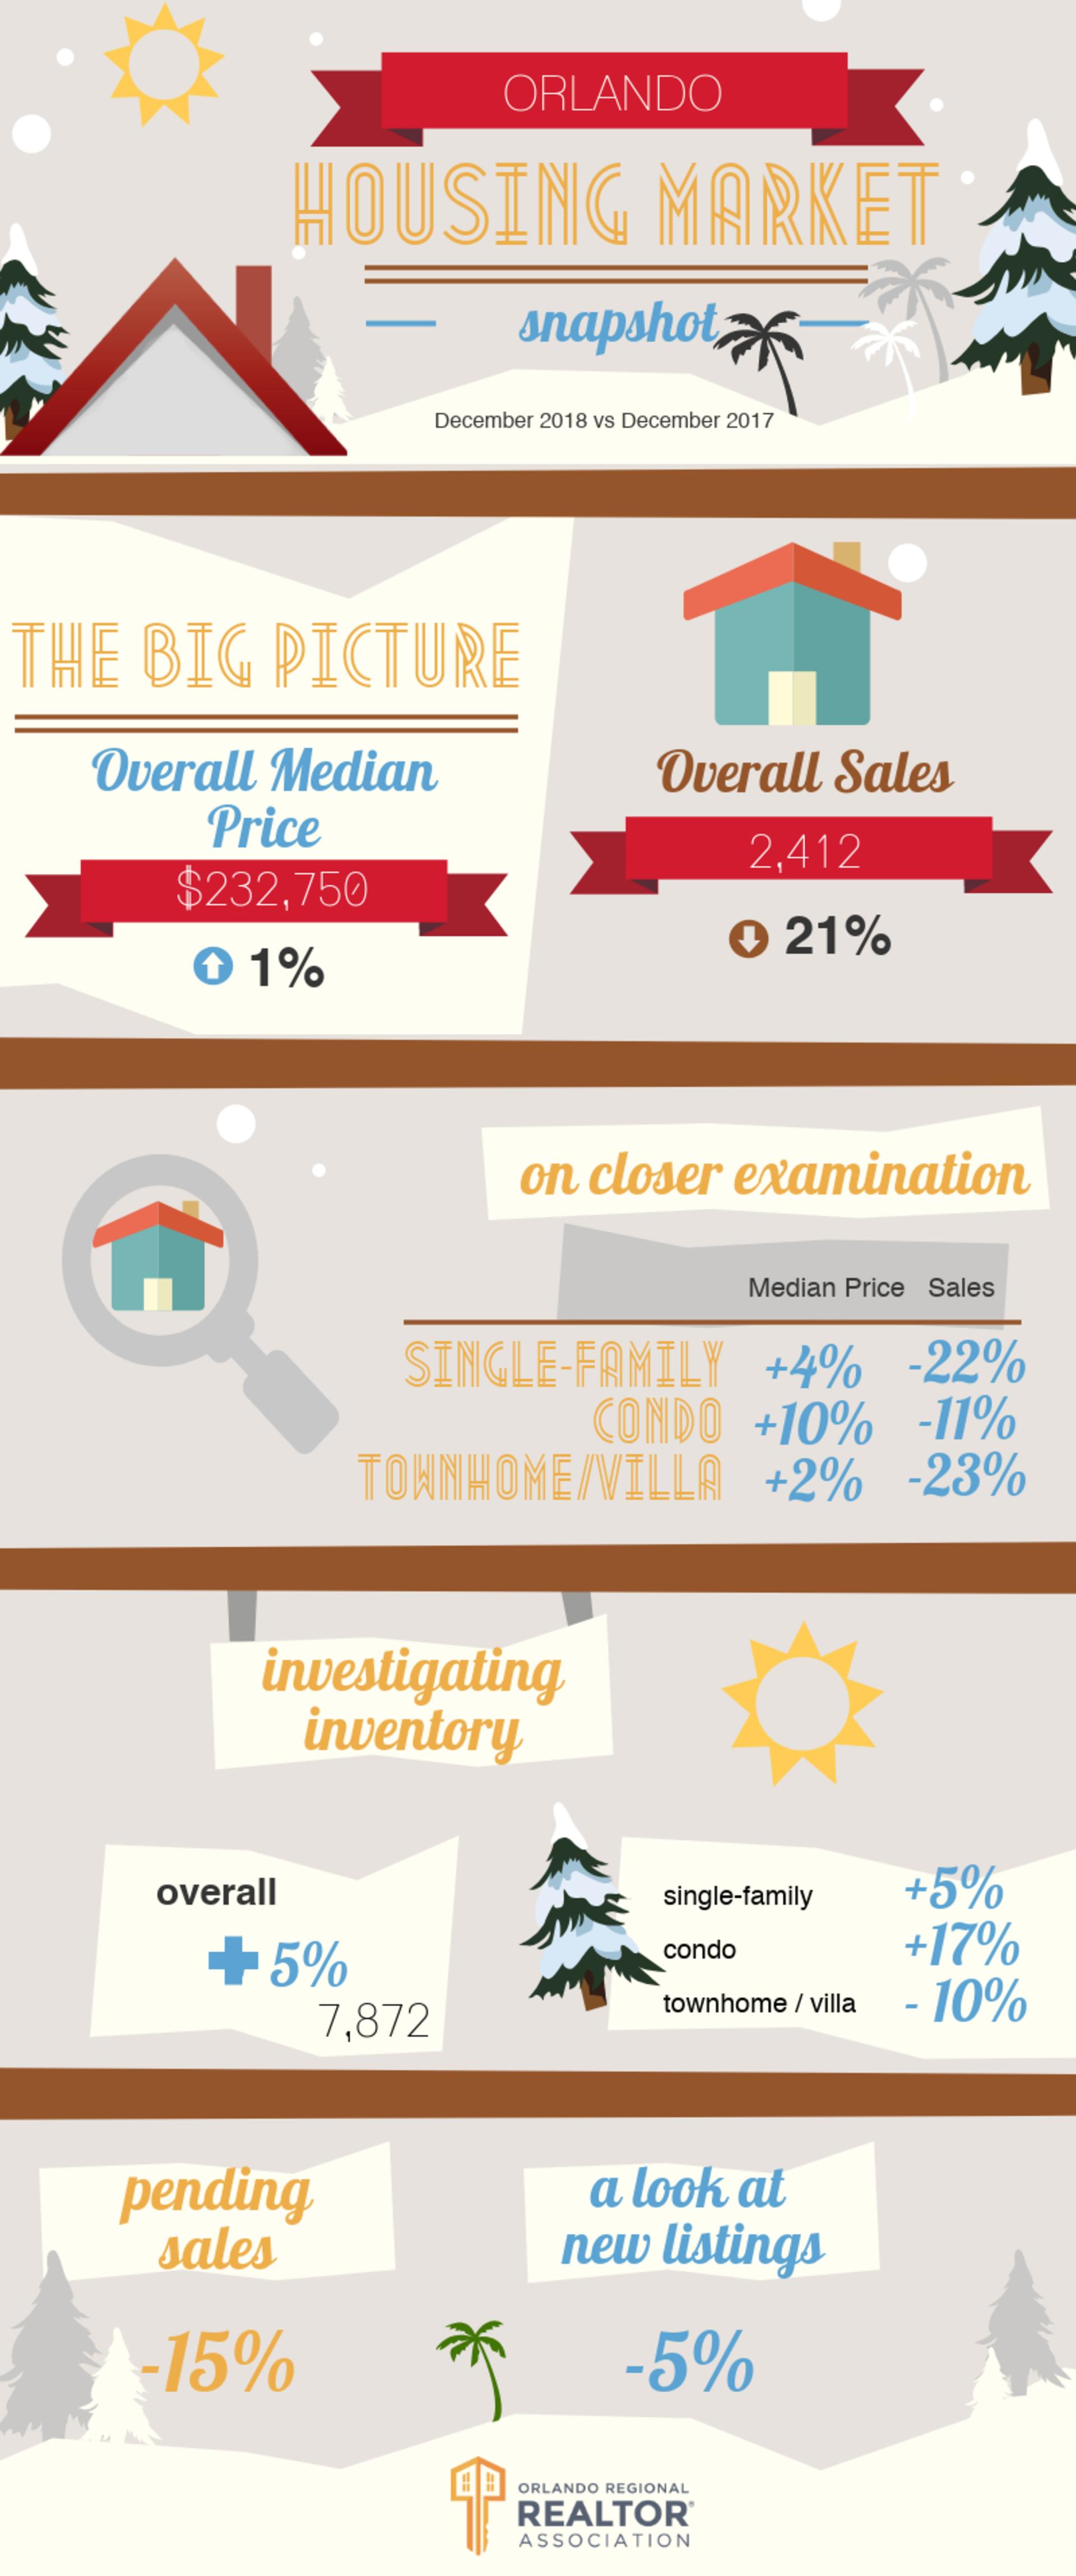 Orlando Housing Market December Report 2018